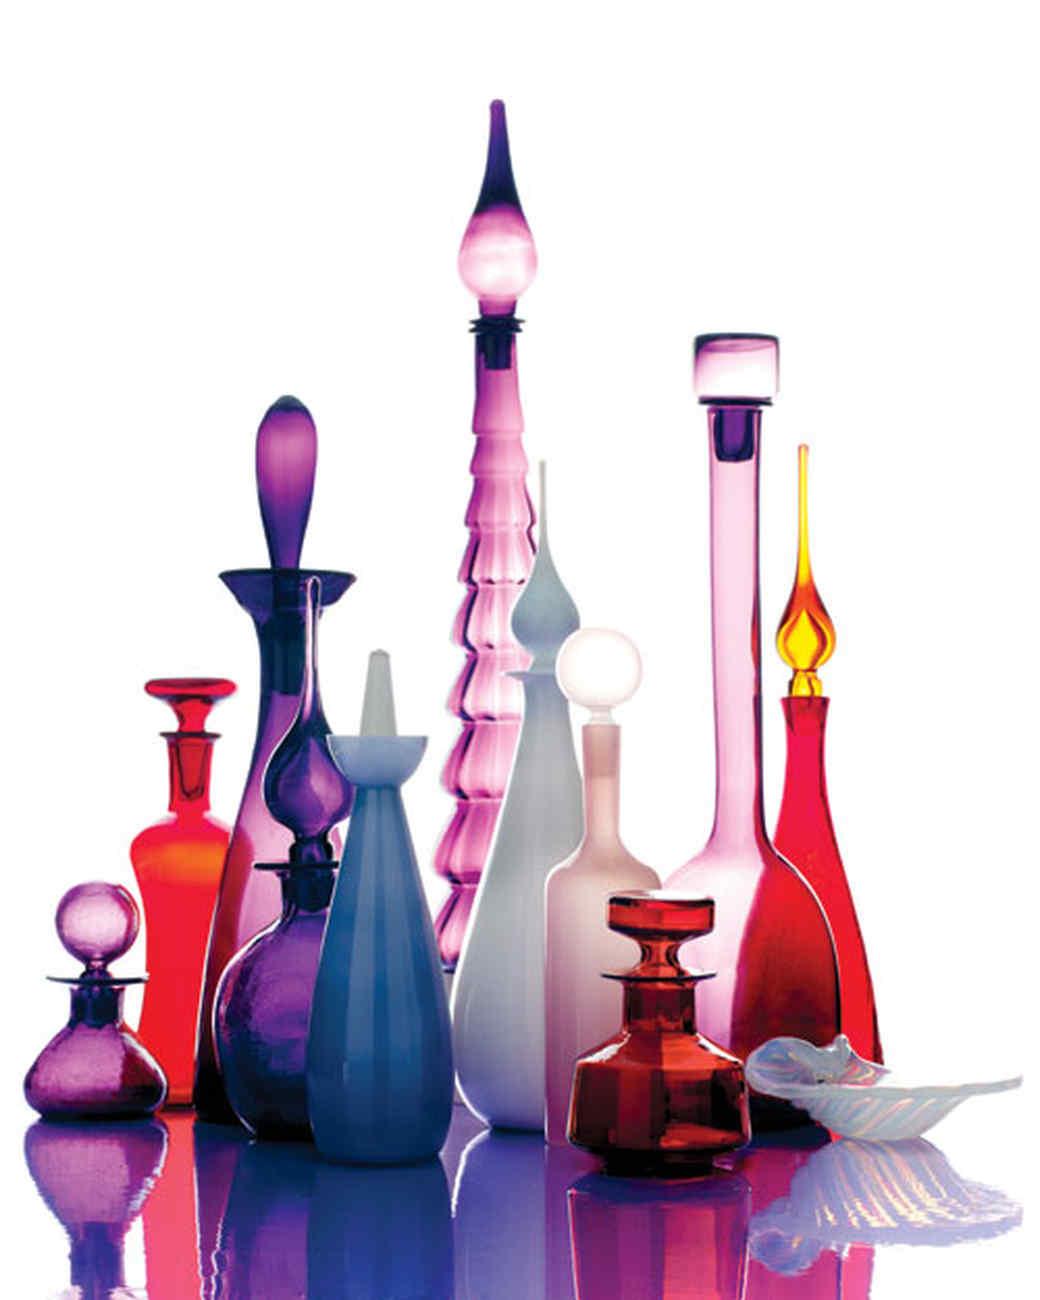 glass-decanter-0511mld107082.jpg